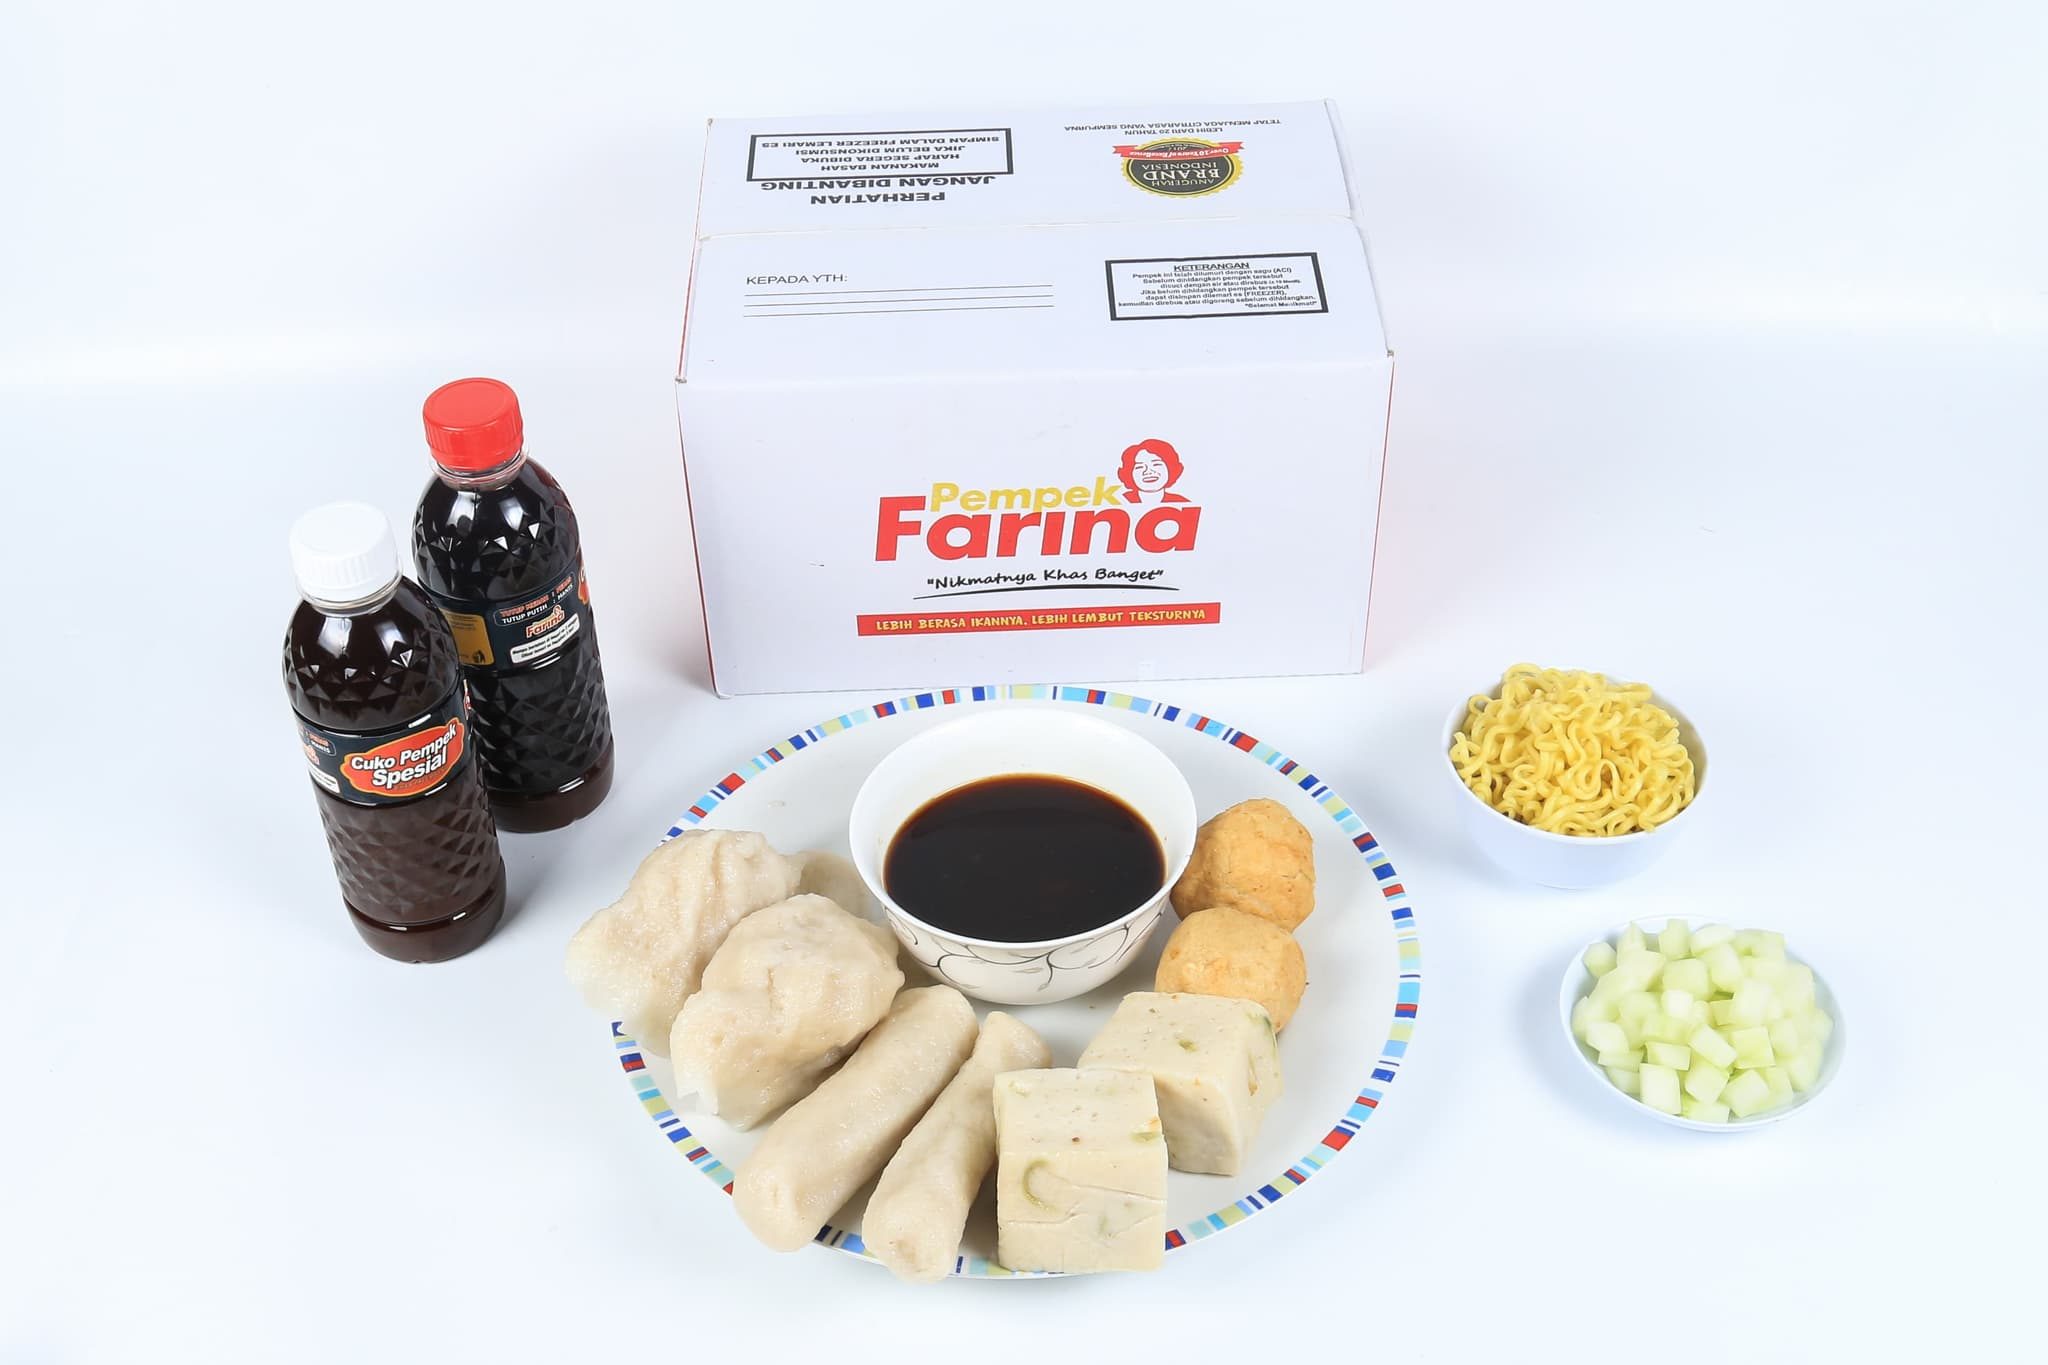 Pempek Farina Paket A2 - Blanja.com